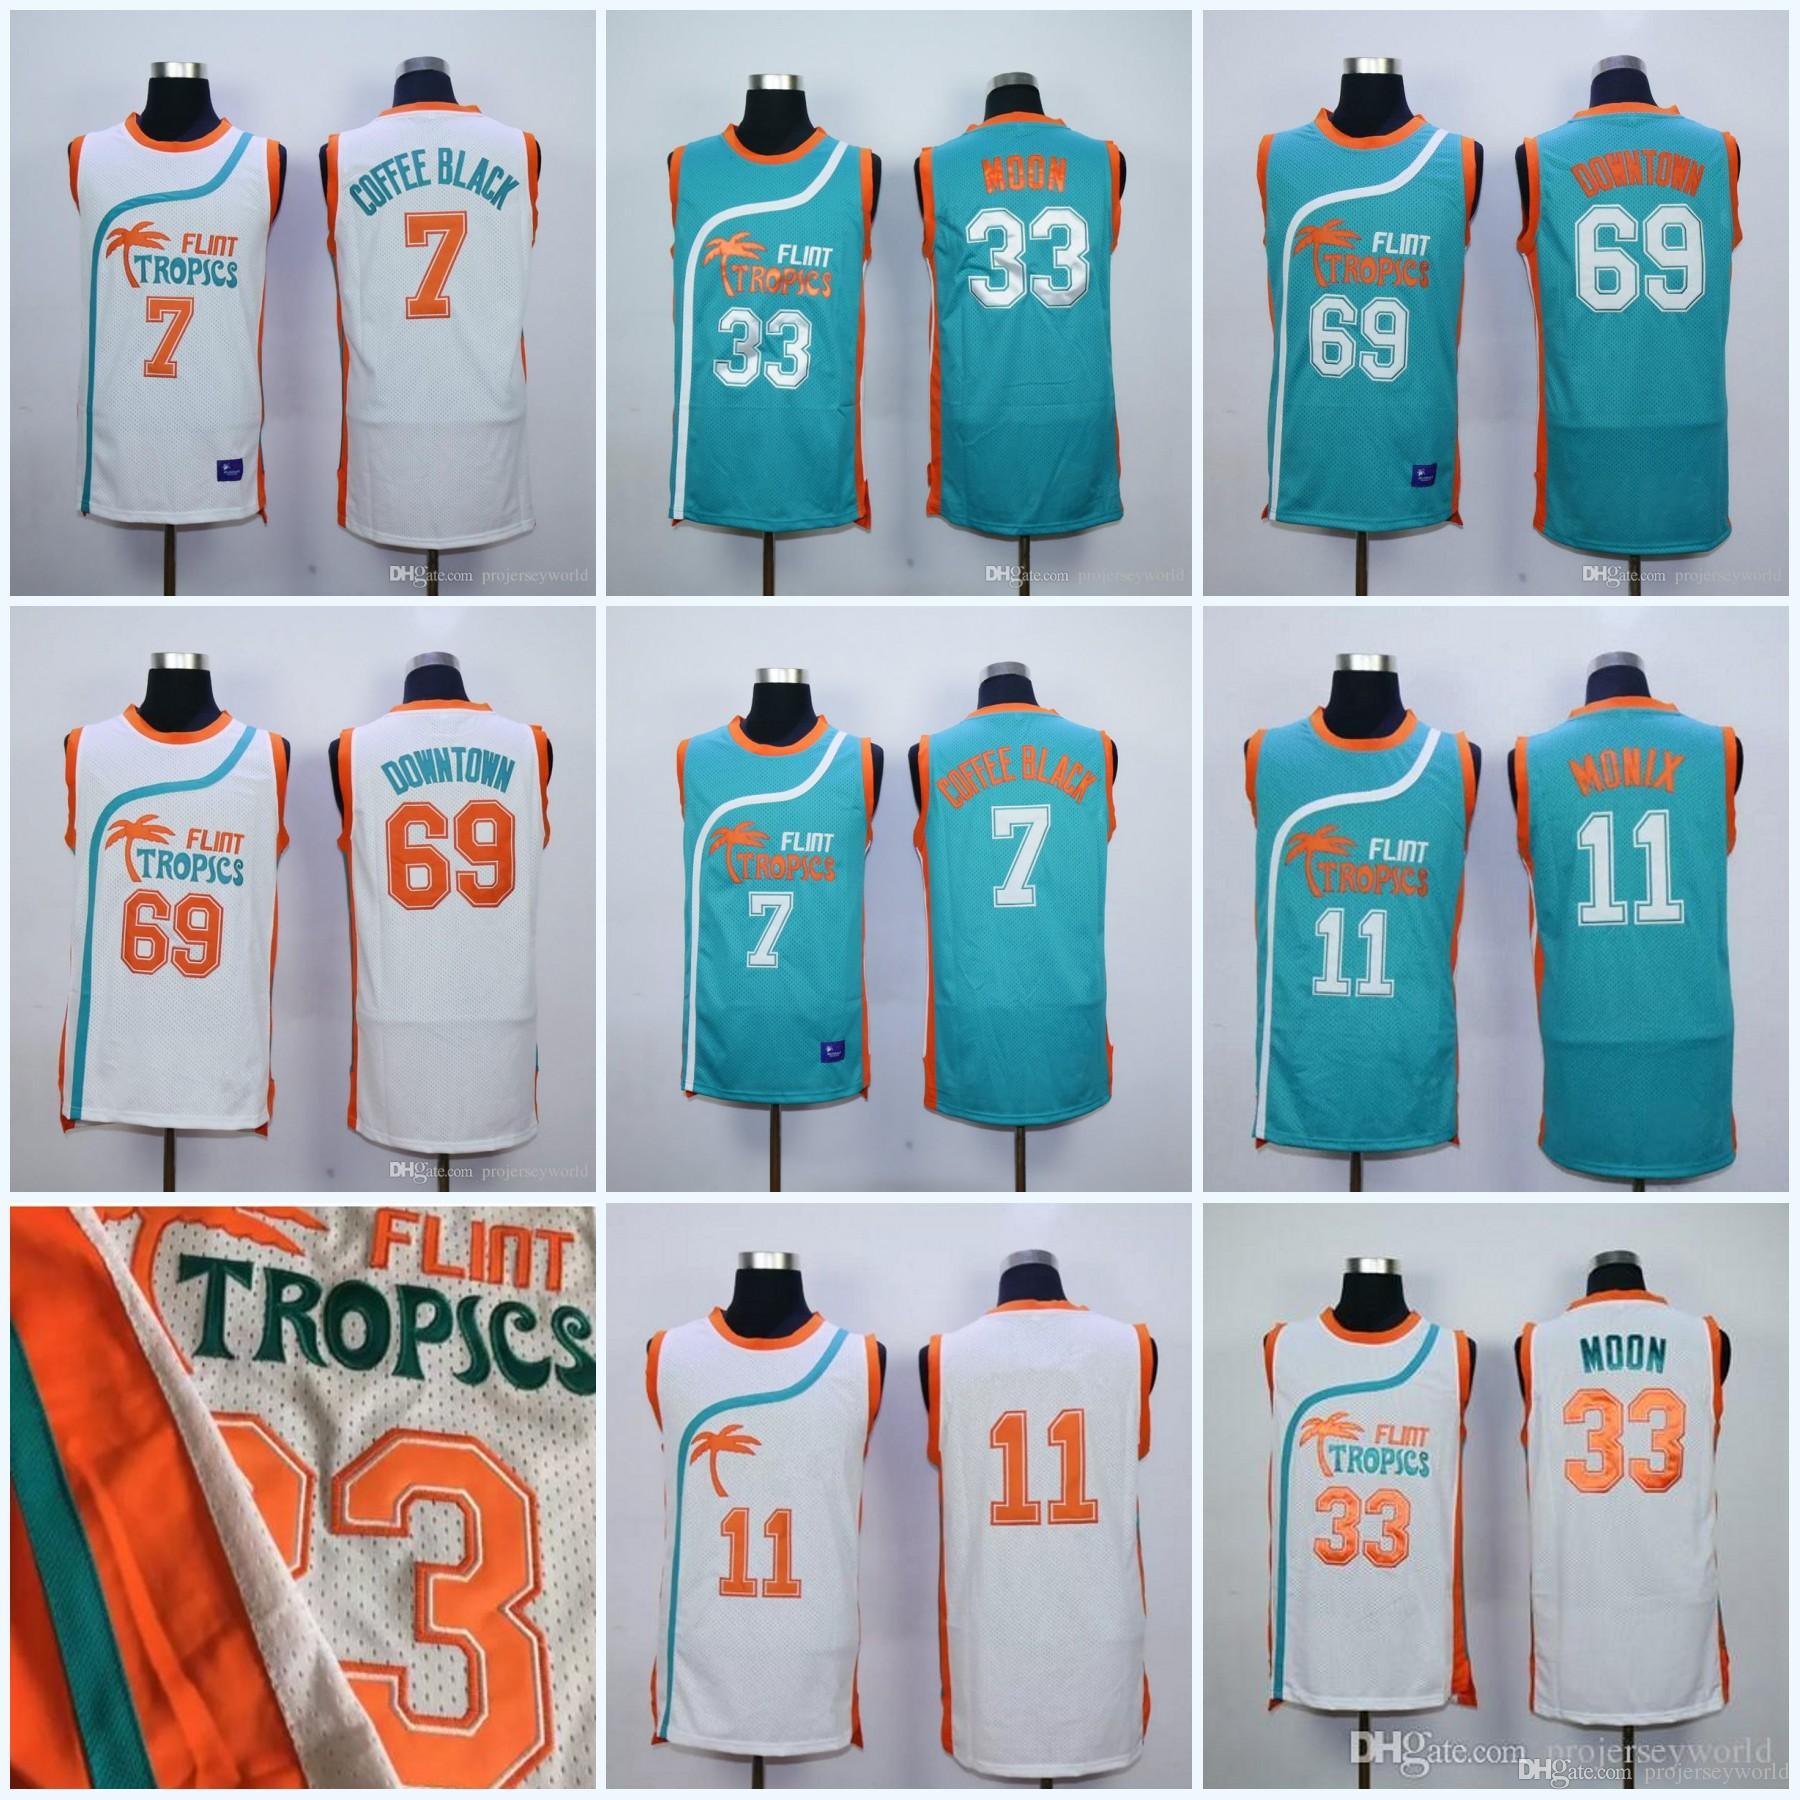 69 Downtown Tropics Semi Pro Movie Jerseys 33 Jackie Moon 7 Coffee Black 11  Ed Monix Basketball Jerseys All Stitched UK 2019 From Projerseyworld f8faed858